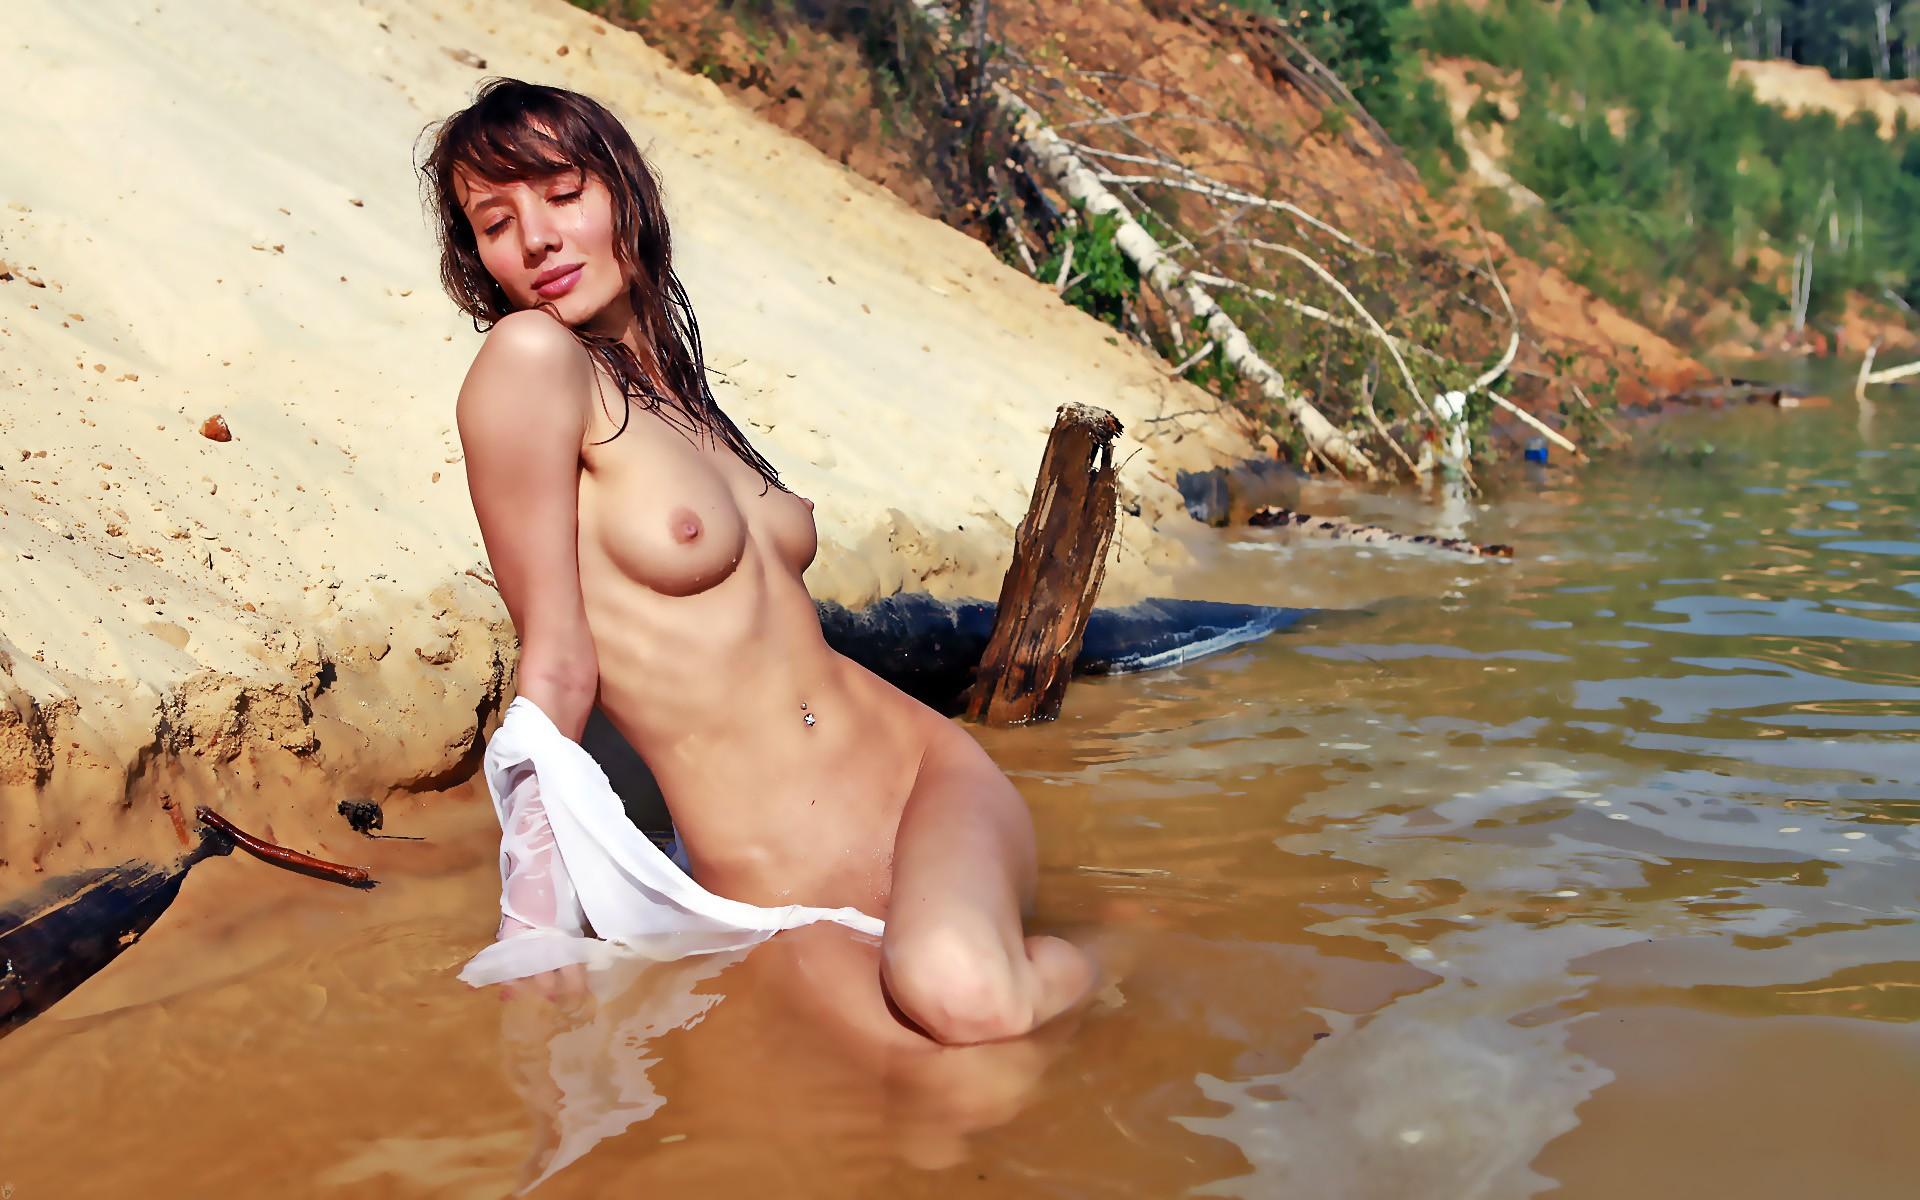 porno nature escort girl lorient